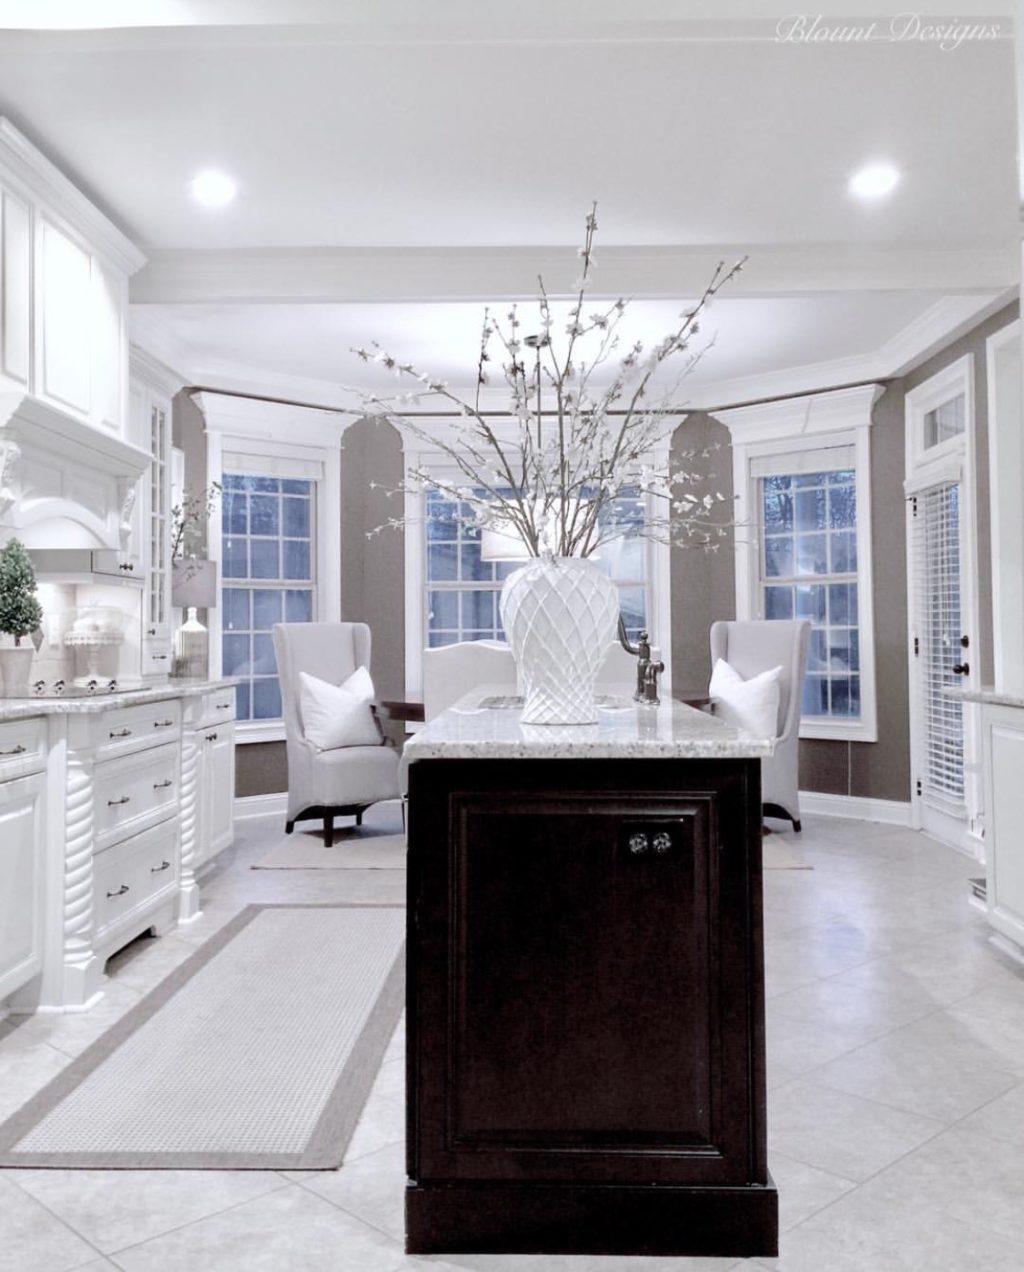 Bright White Home of Deborah Blount bright white kitchen